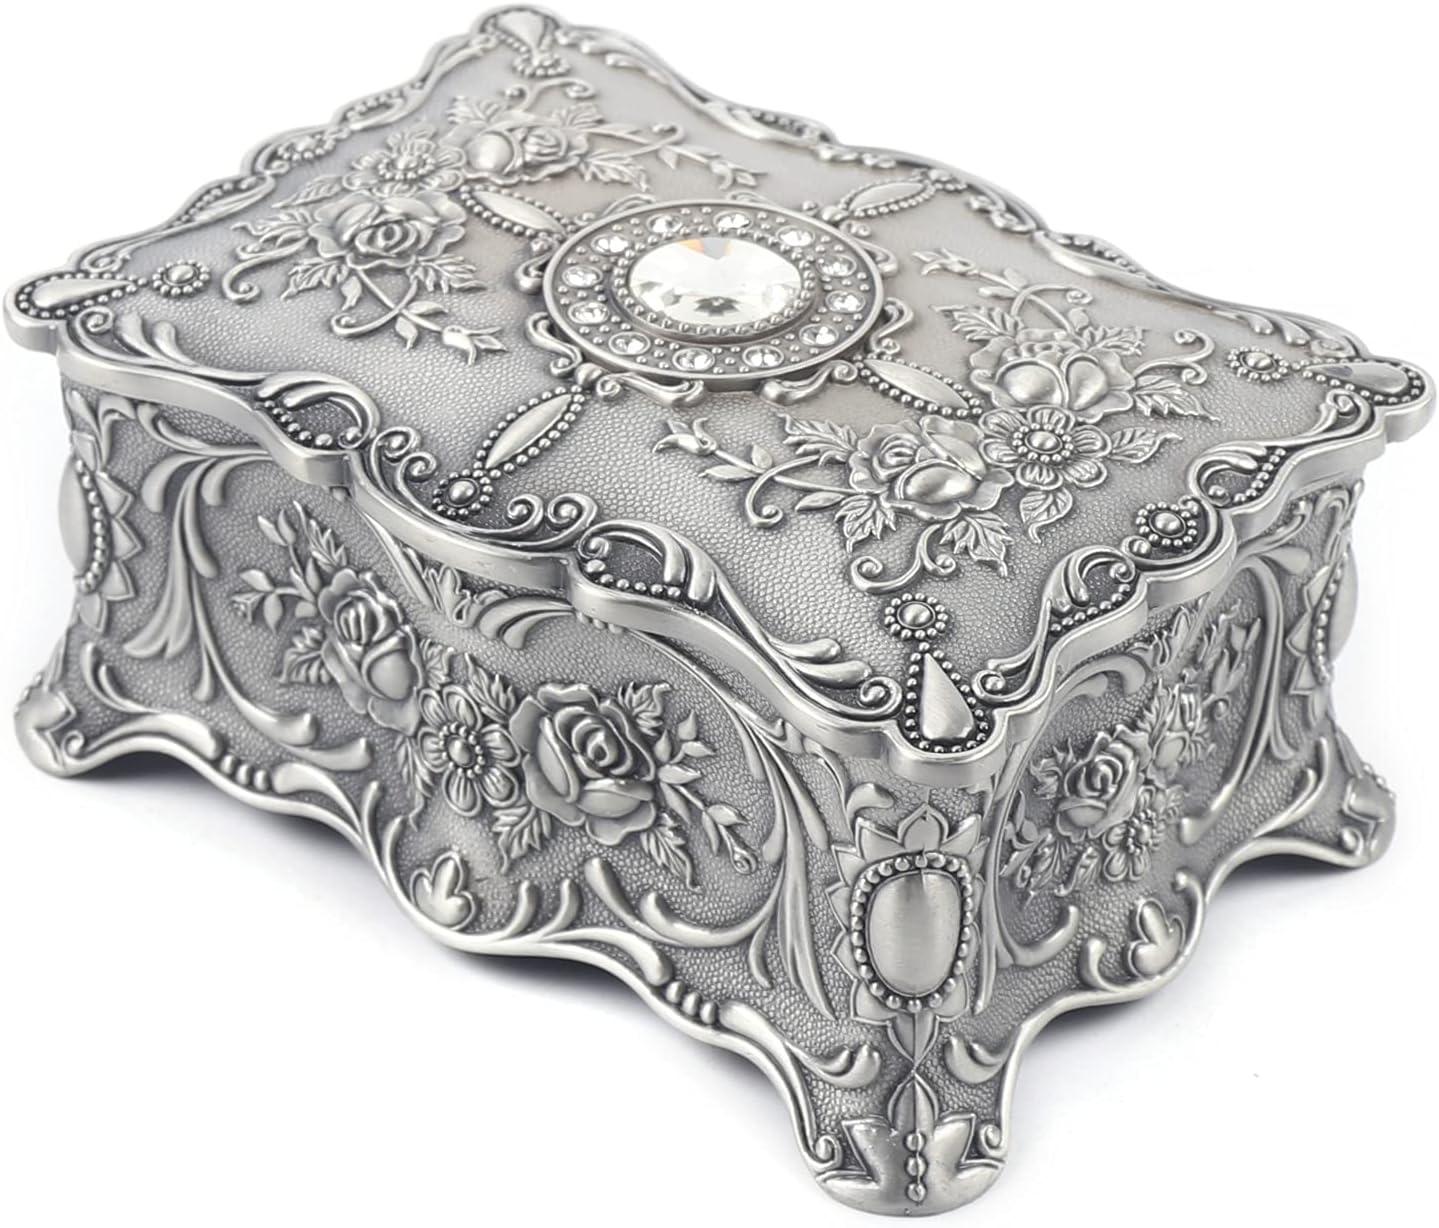 Gdrasuya10 Palace Retro Style Ranking TOP9 Jewelry Storage Trink Dealing full price reduction Vintage Box